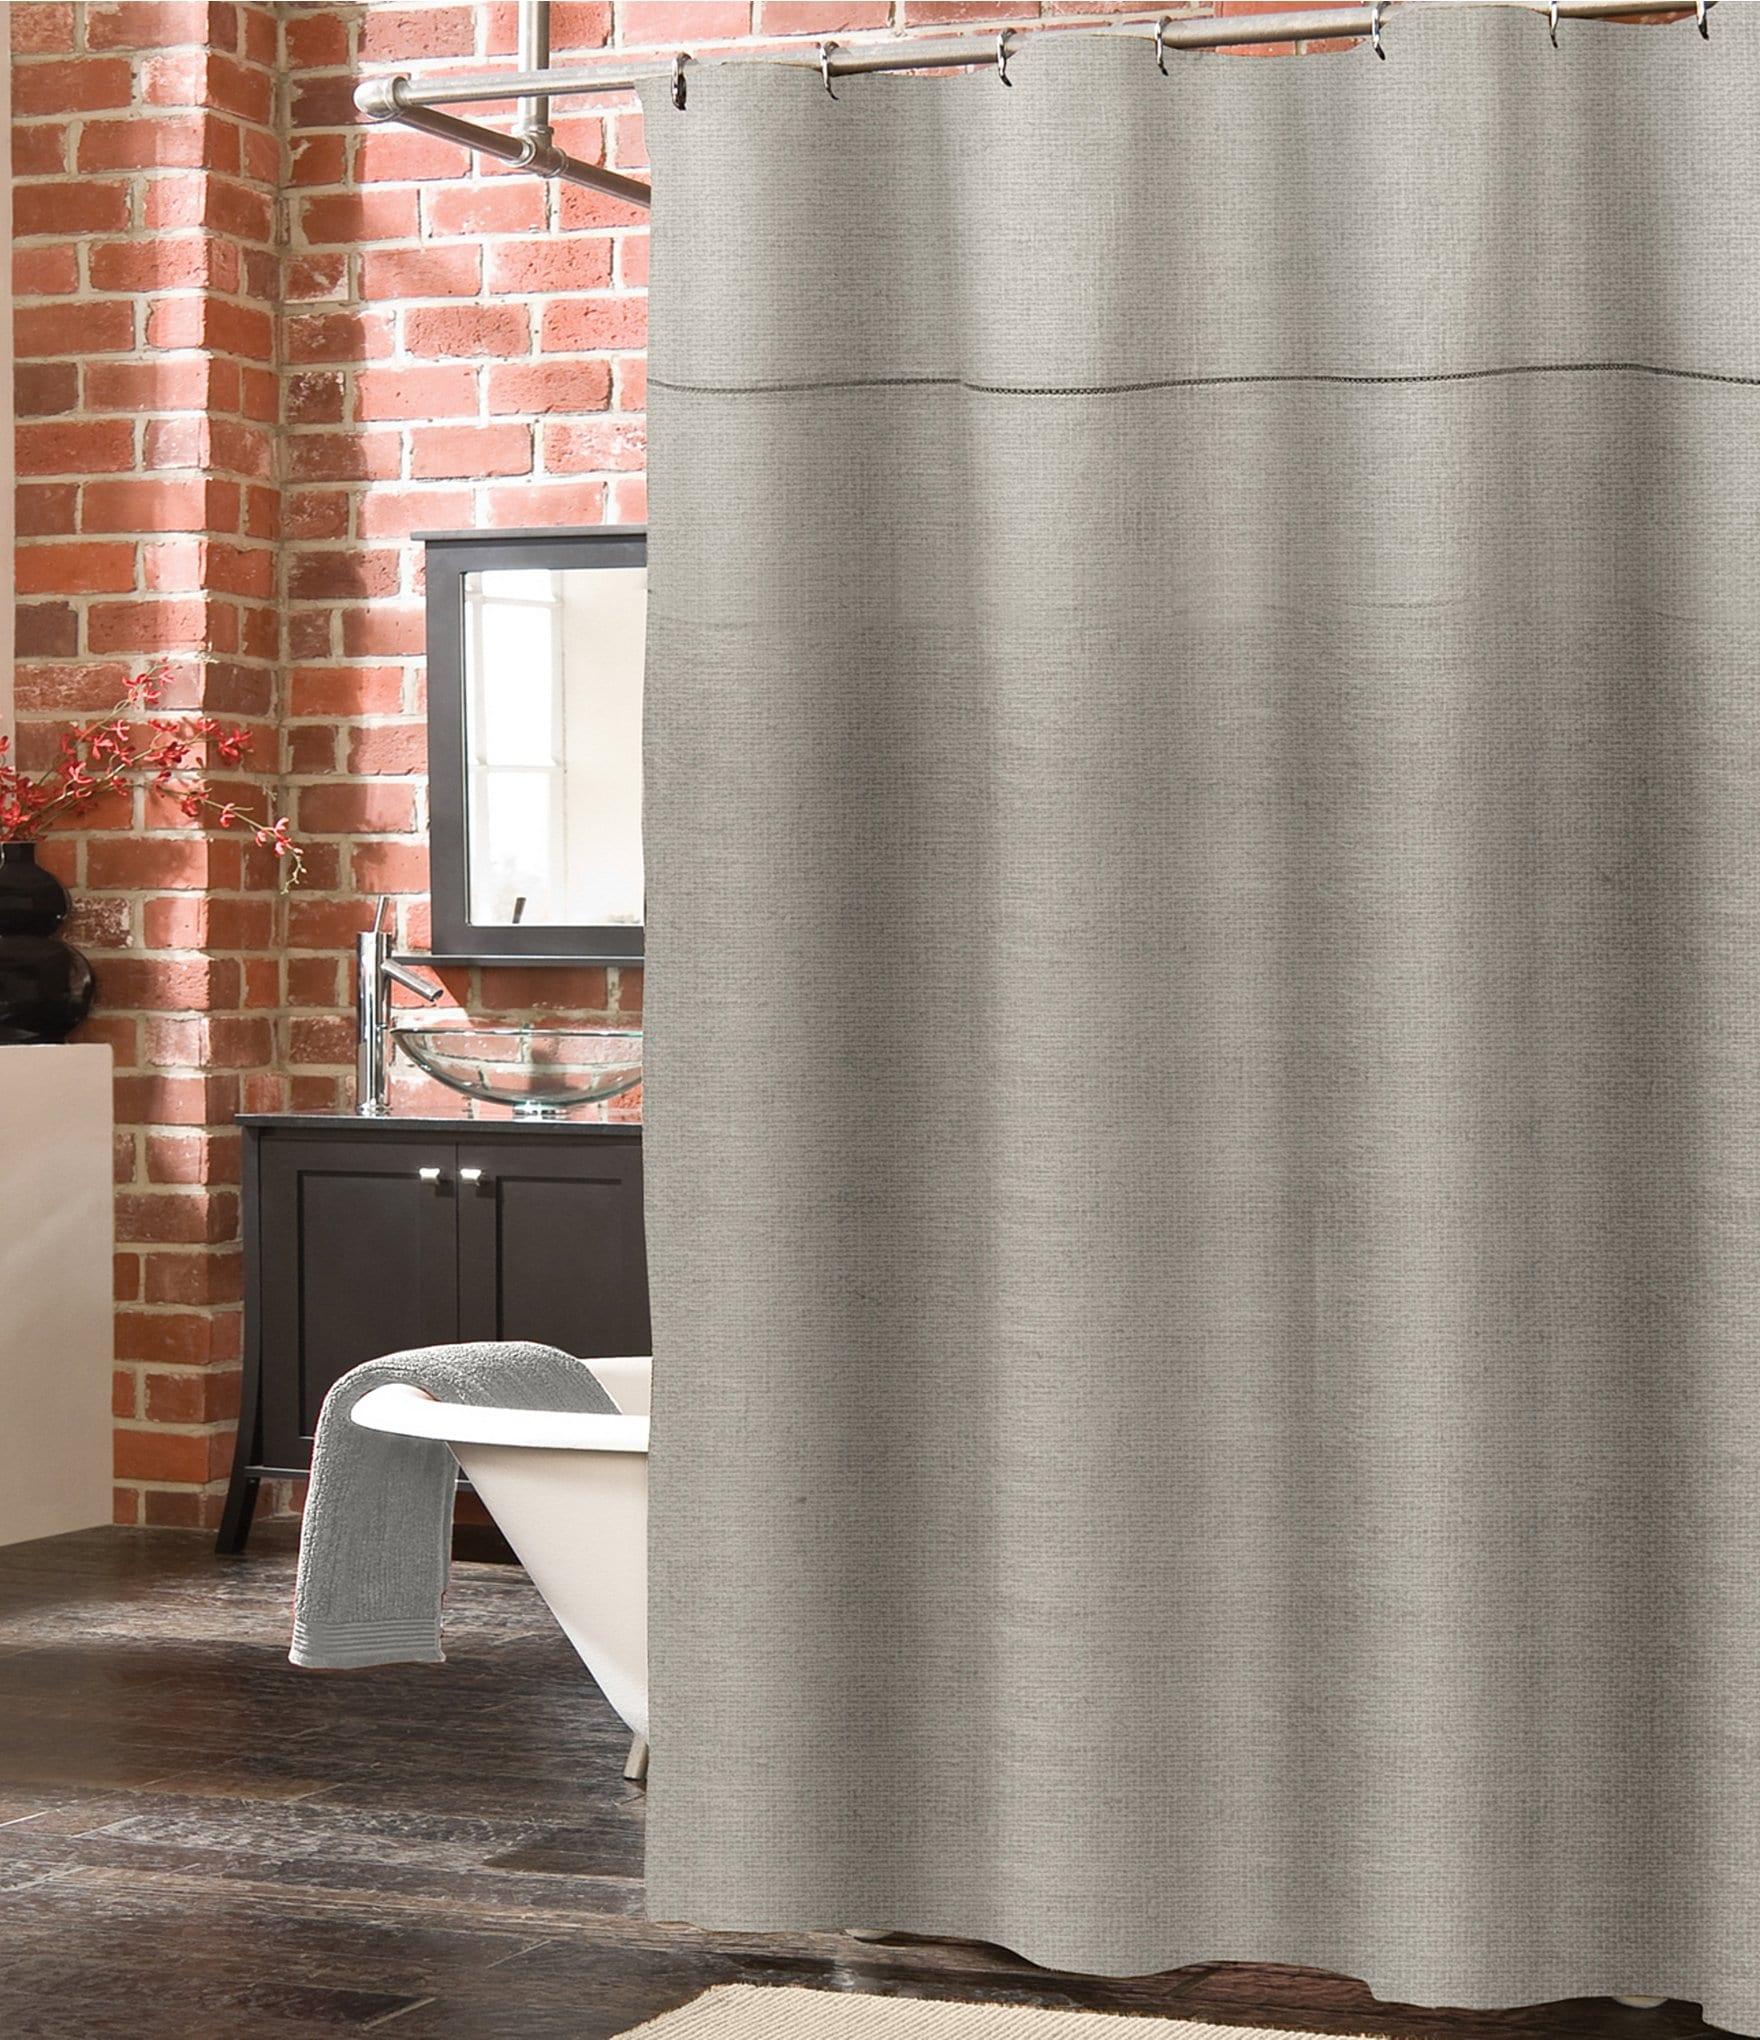 Bamboo shower curtain - Bamboo Shower Curtain 11